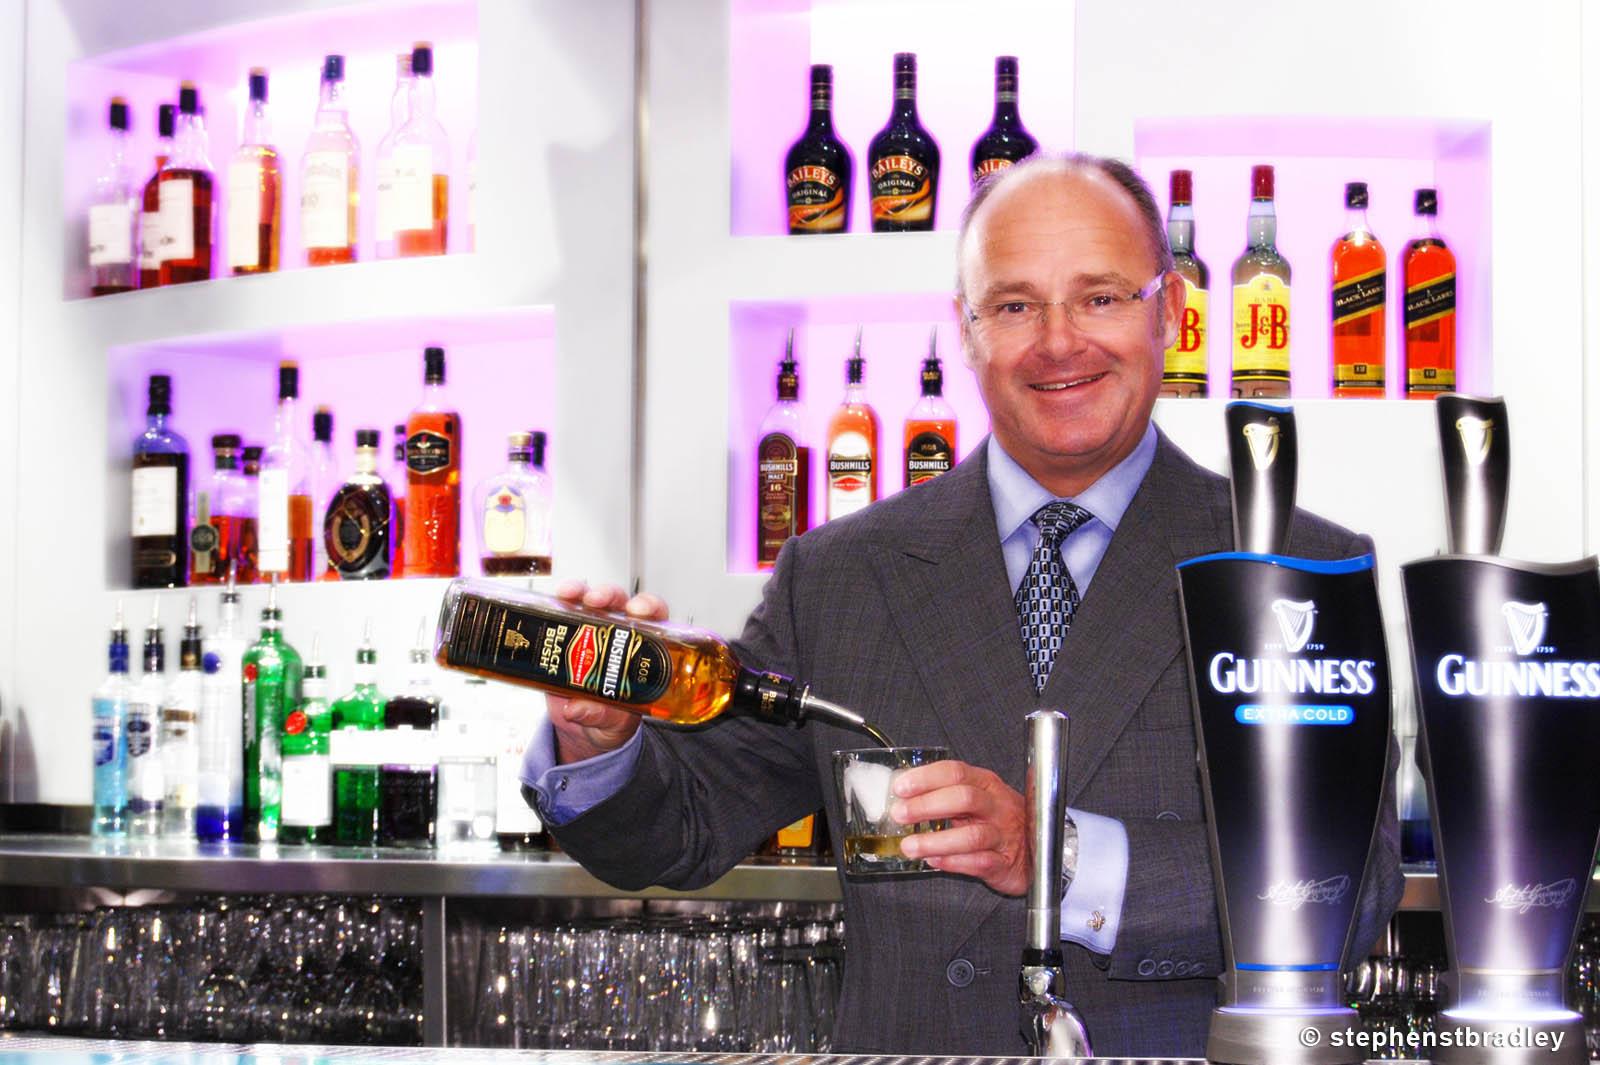 PR Photographer Dublin Ireland portfolio photo of former Diageo CEO Paul Walsh - photo 2257 by Stephen T Bradley PR photography and video production services Dublin, Ireland